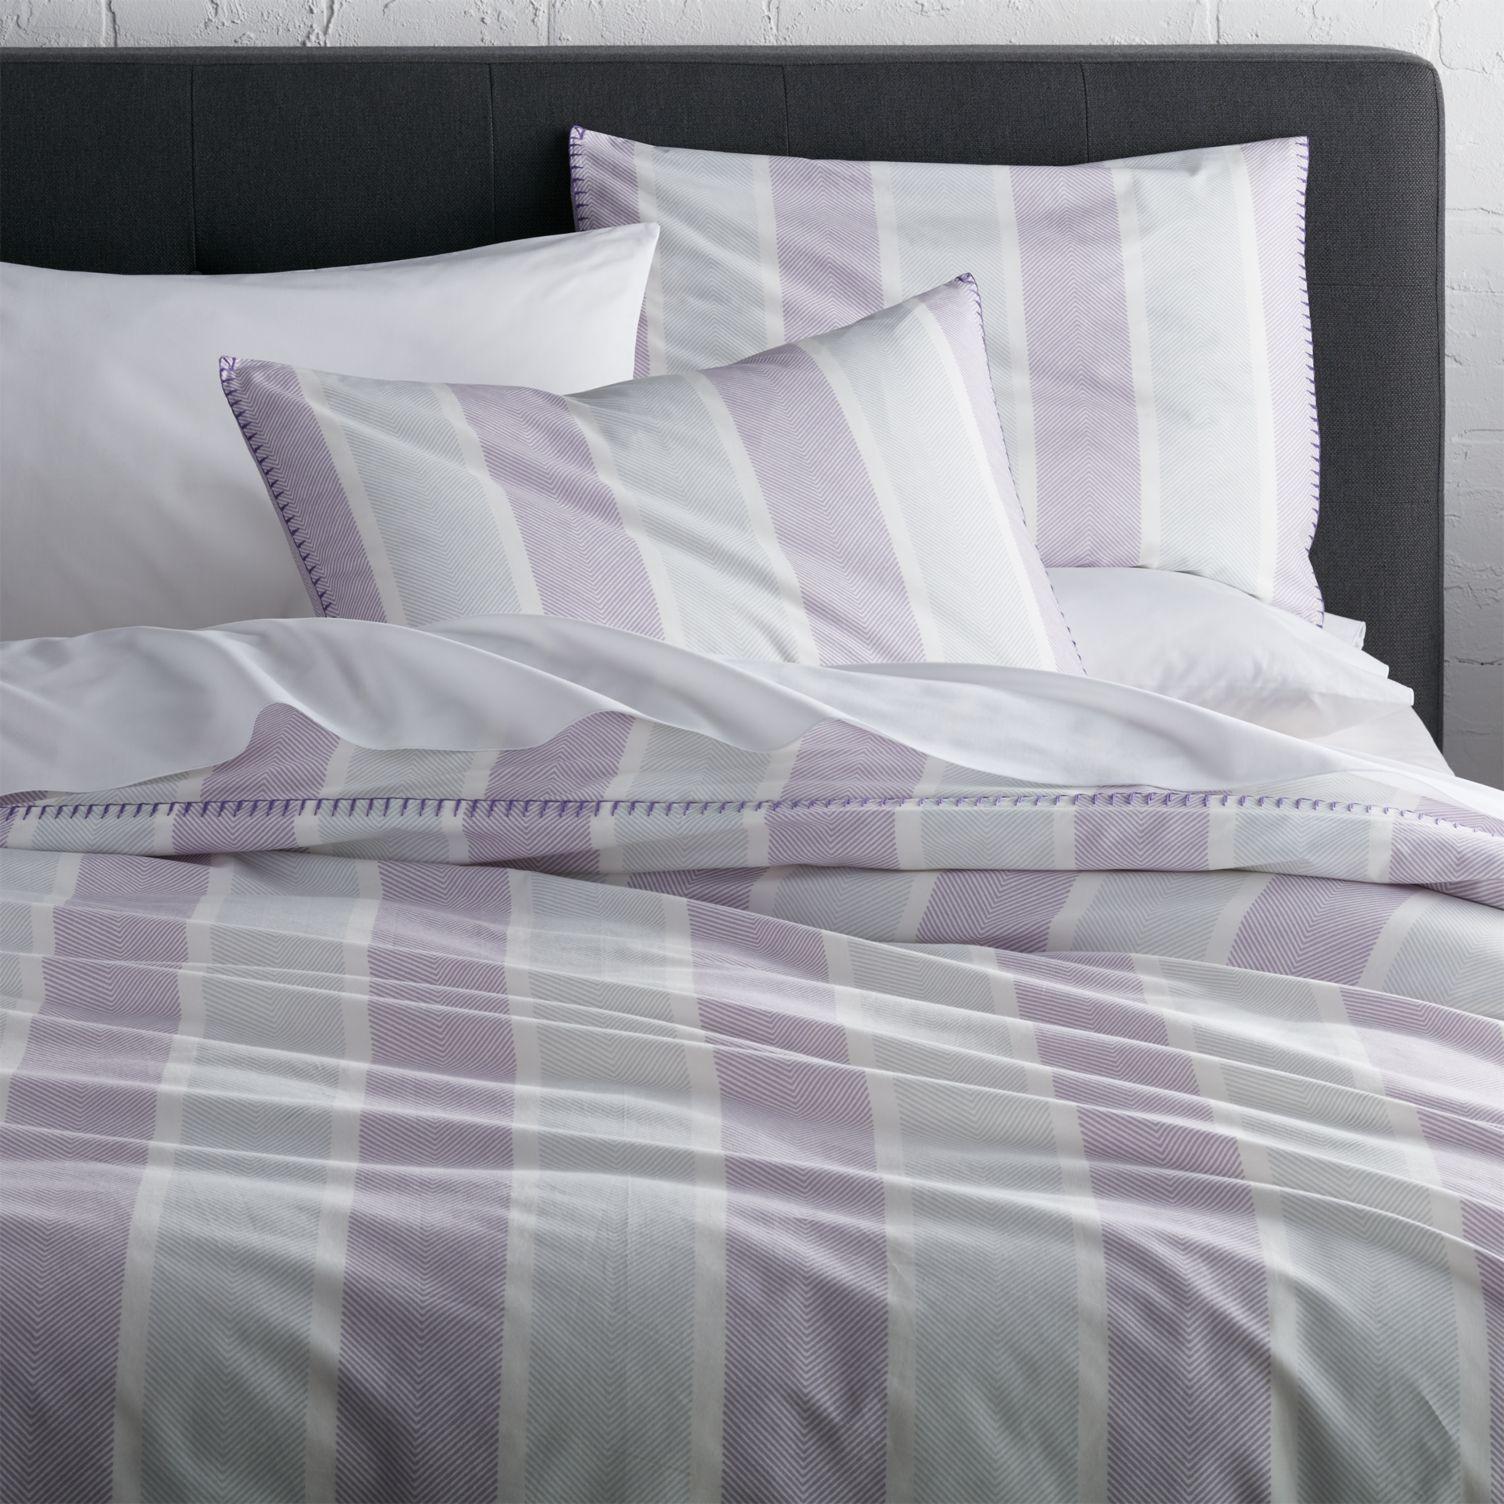 Duvet cover with lavender stripes